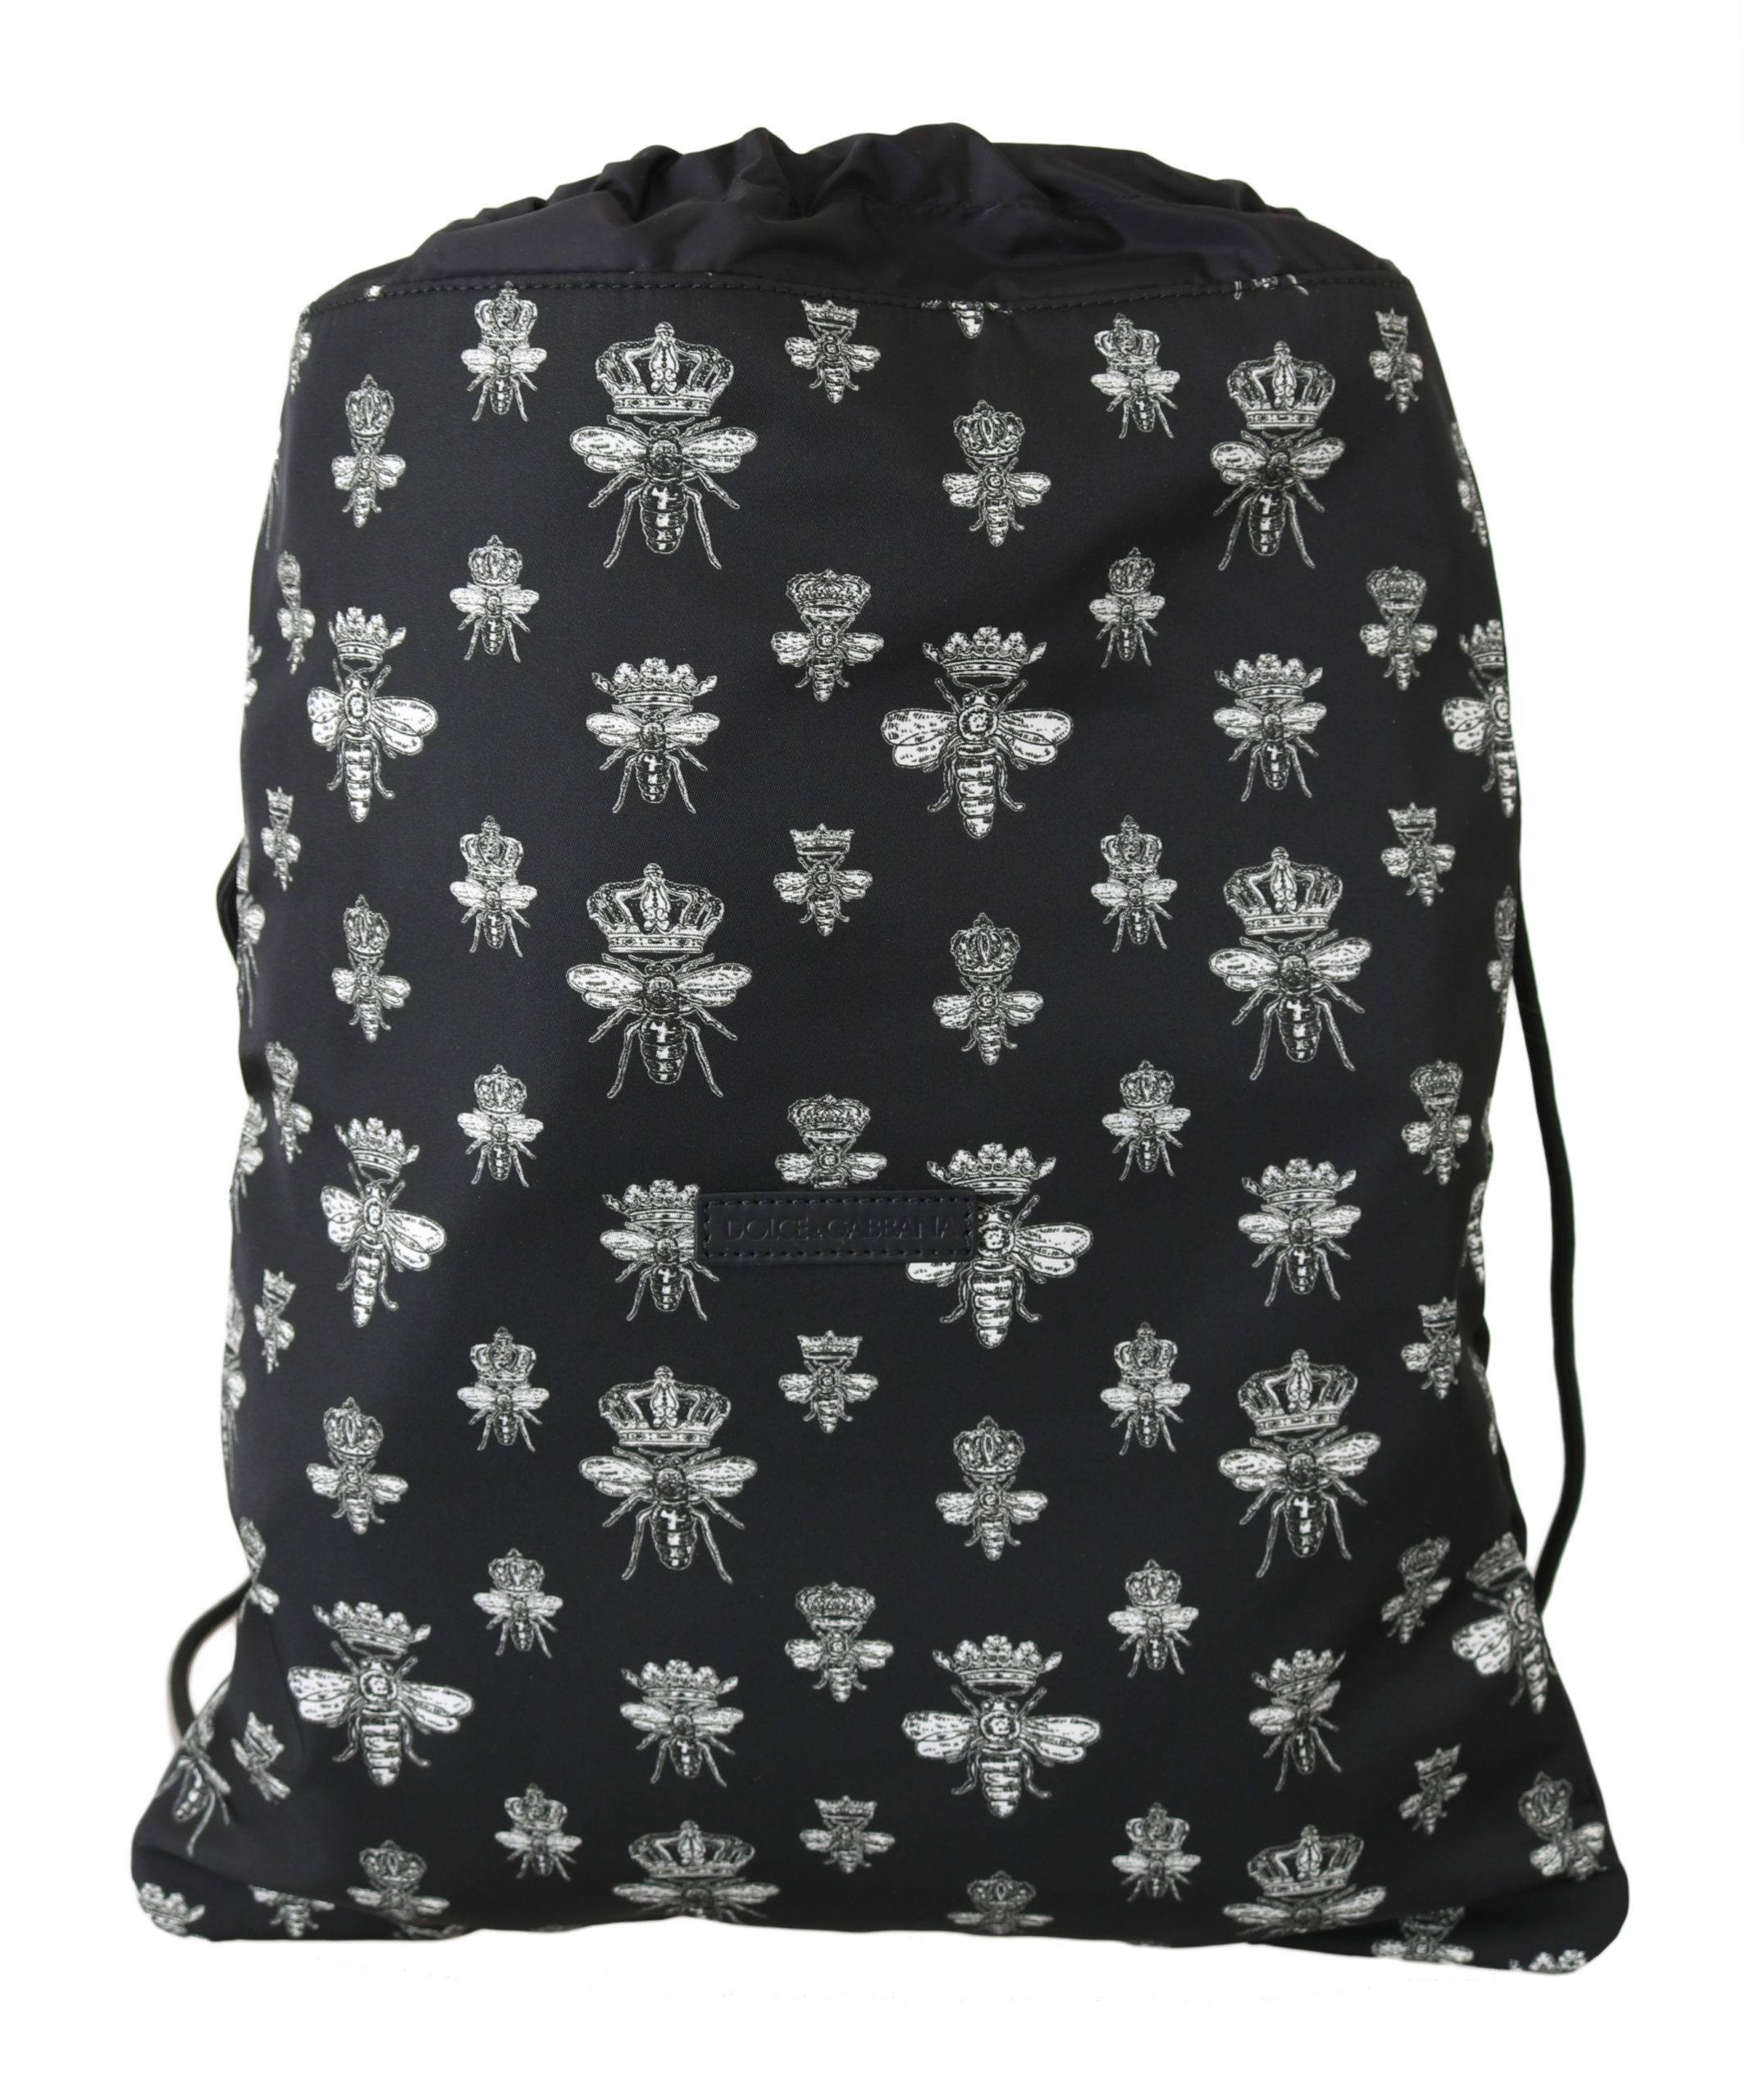 Dolce & Gabbana Women's Bee Crown Nap Sack Backpack Black VA8643